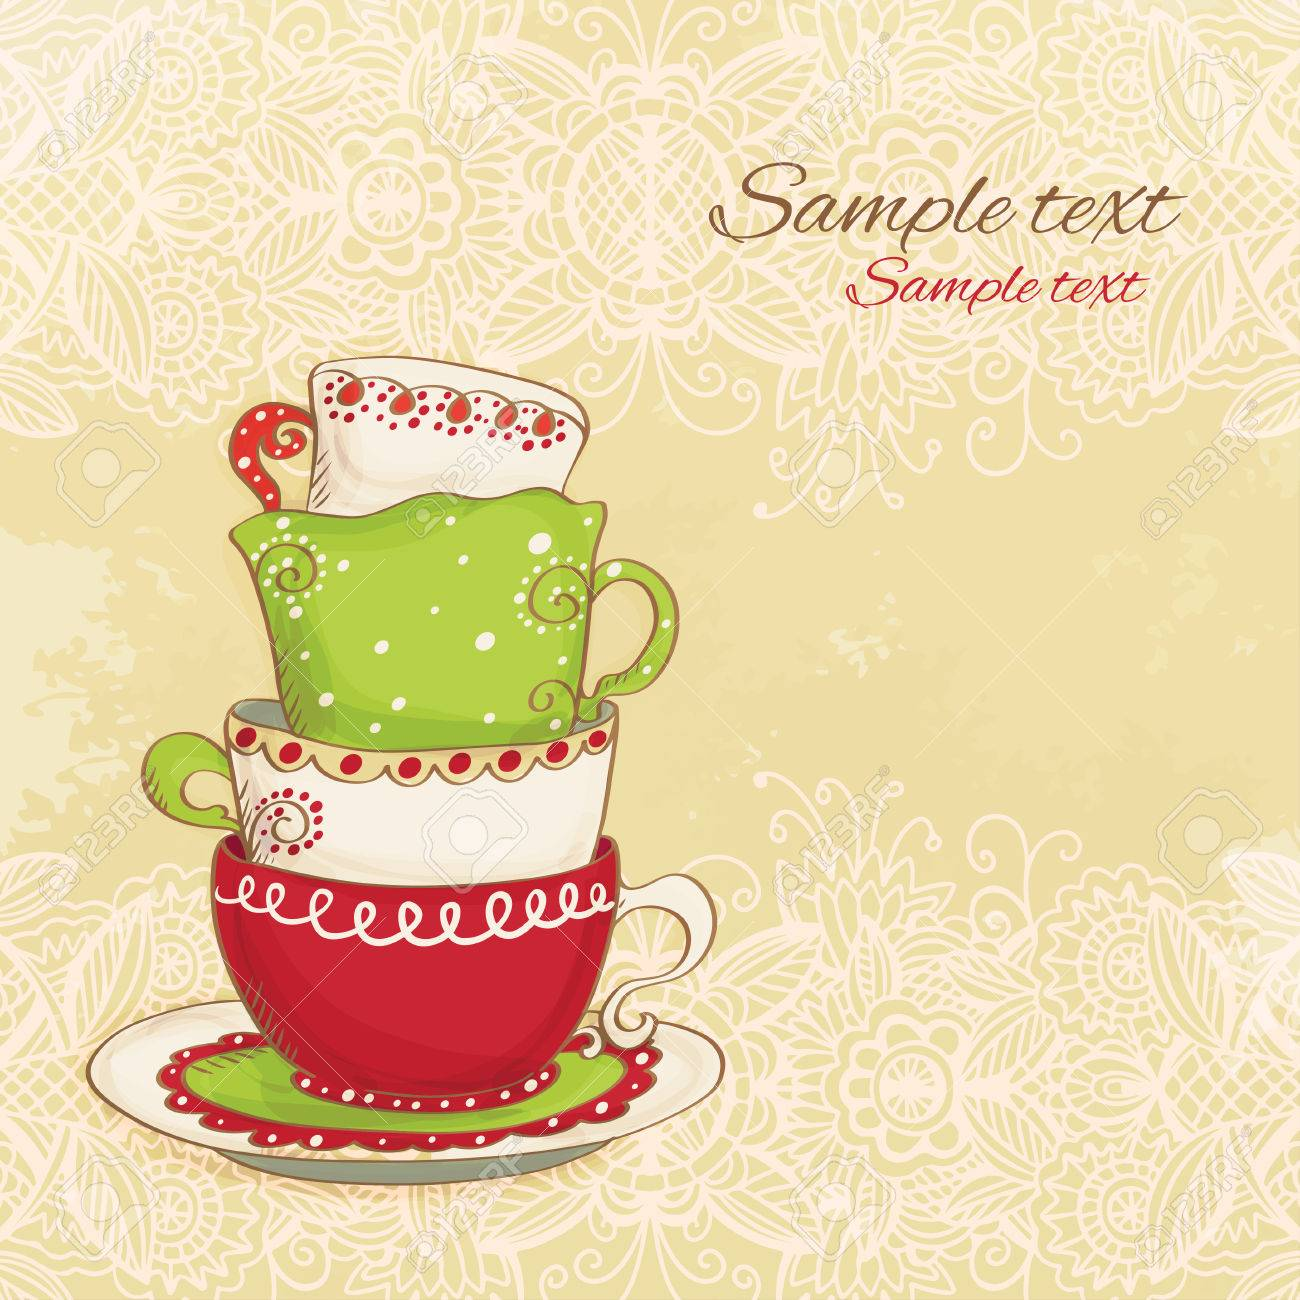 Elegant tea party invitation template with teacups cartoon vector - Tea Party Vintage Background Vector Stock Vector 22587548